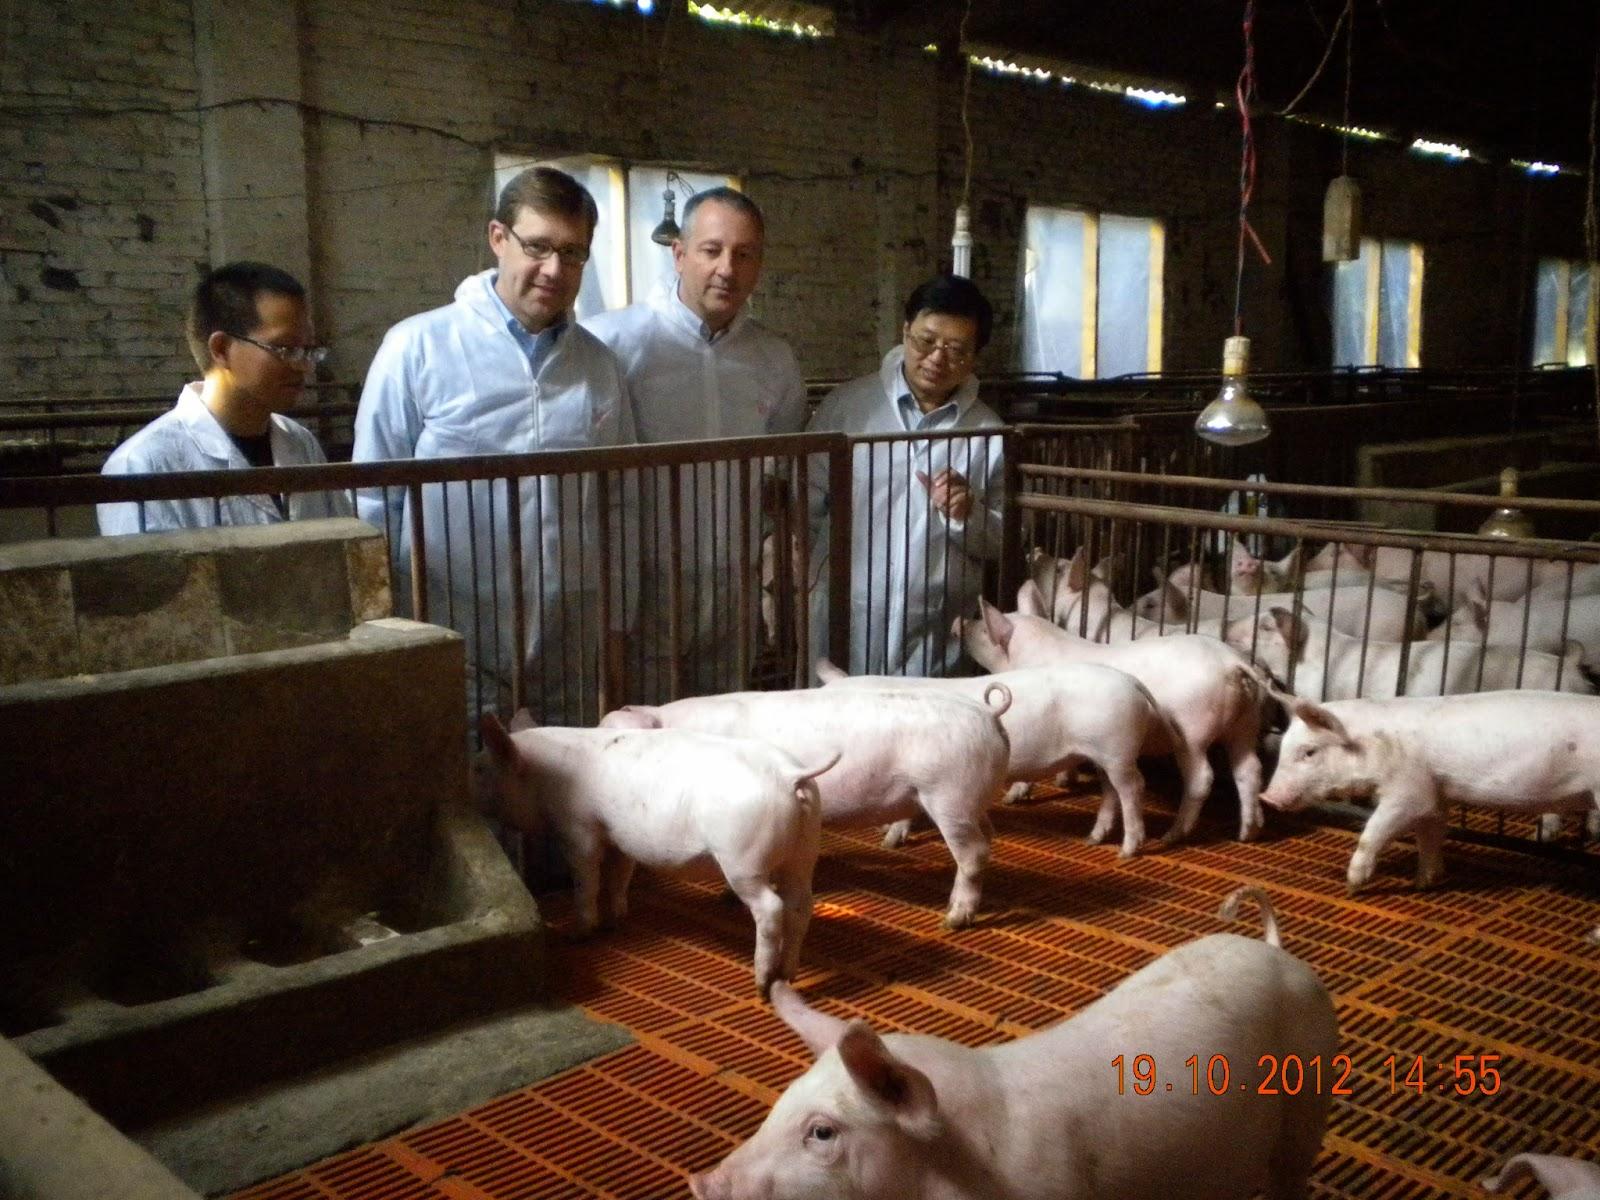 Farm Animals Working Together